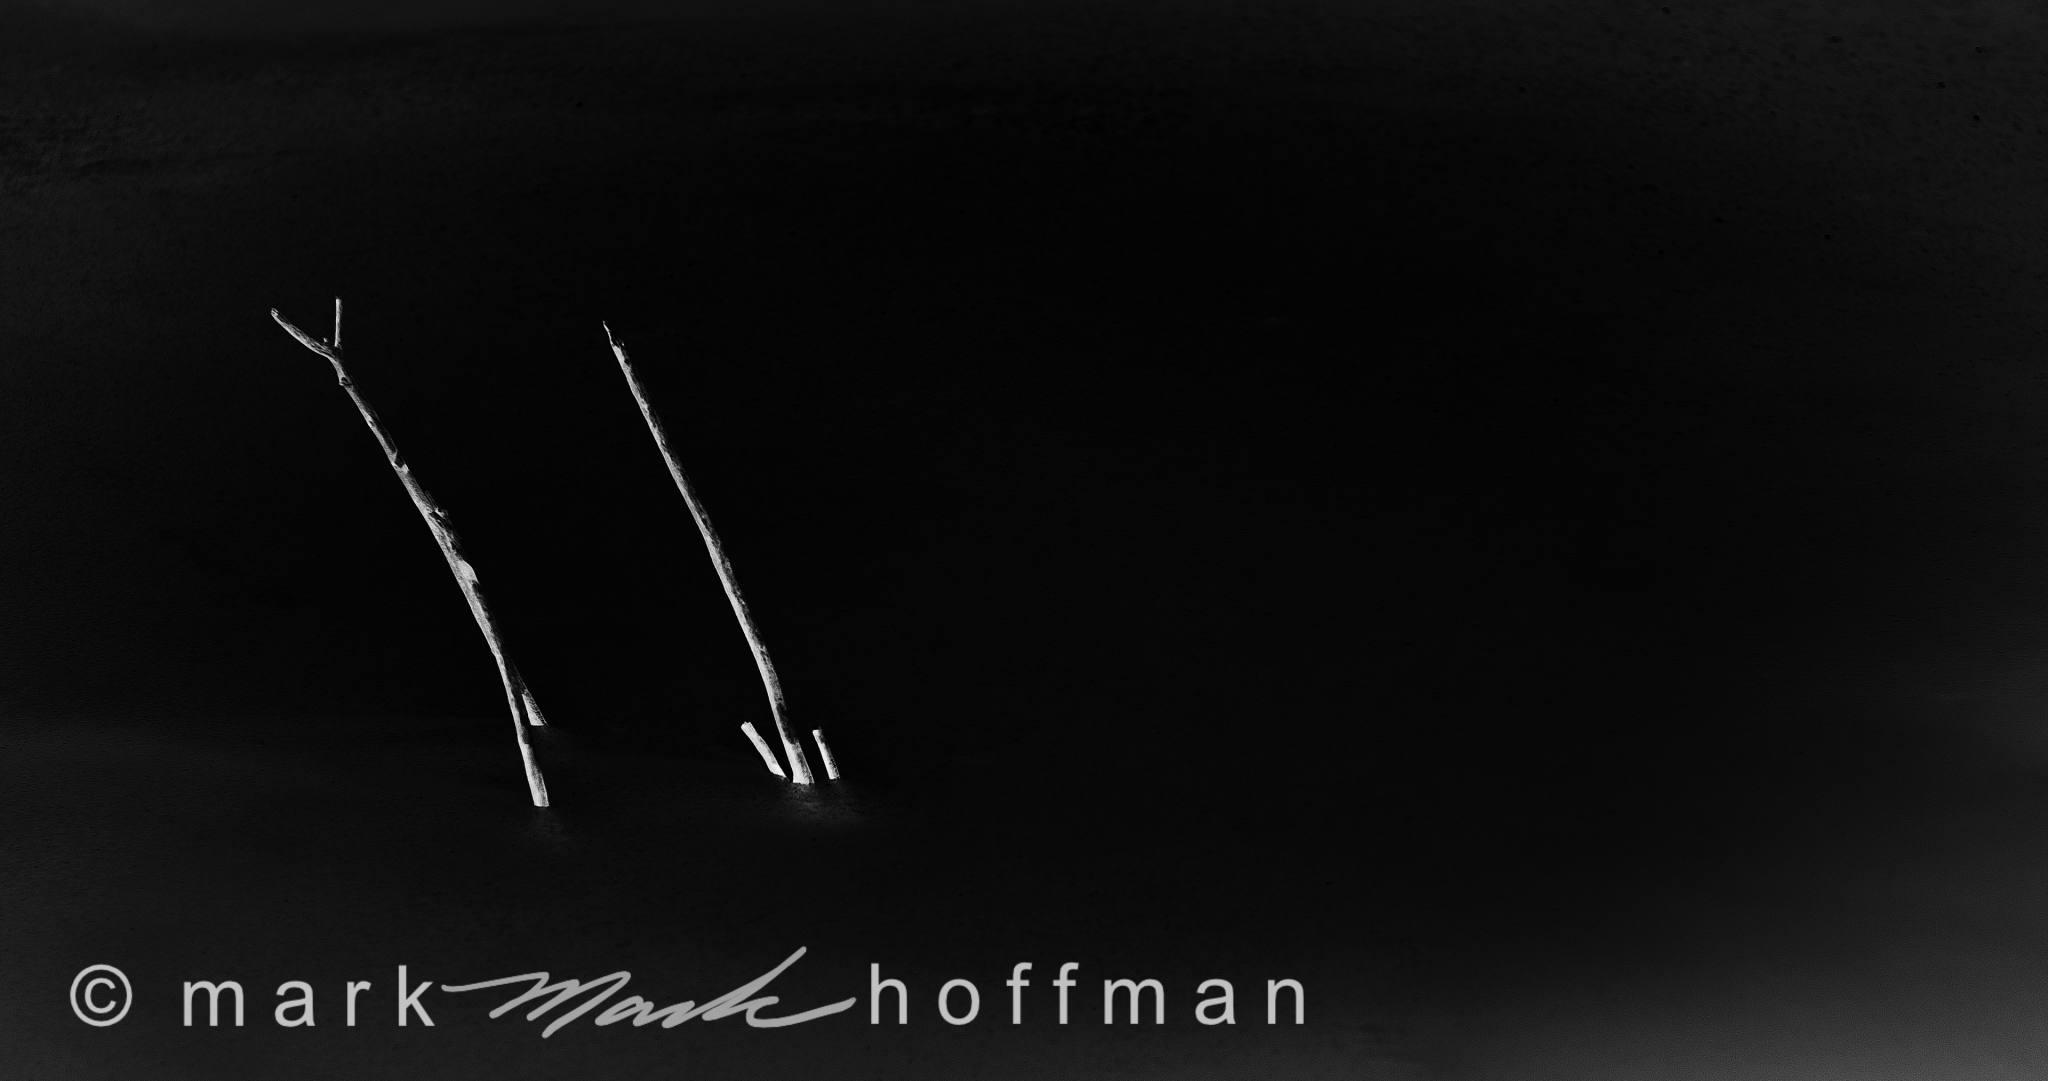 Mark_Hoffman_ND25687_Edit_2_cap1_var1.jpg